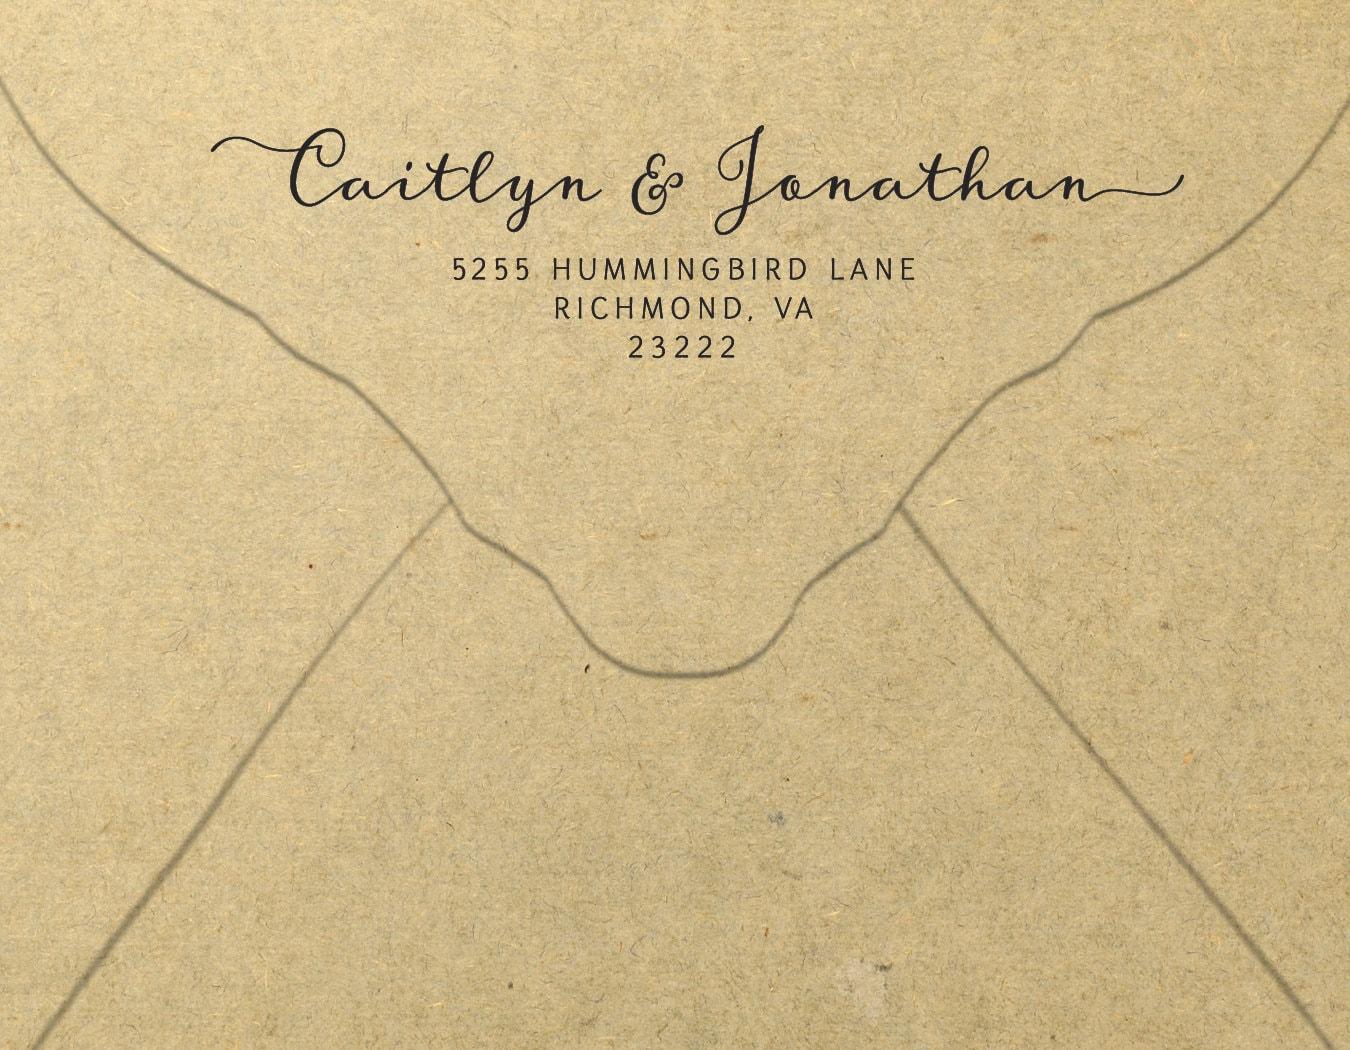 Printable Return Address Envelope Diy Stationery Template